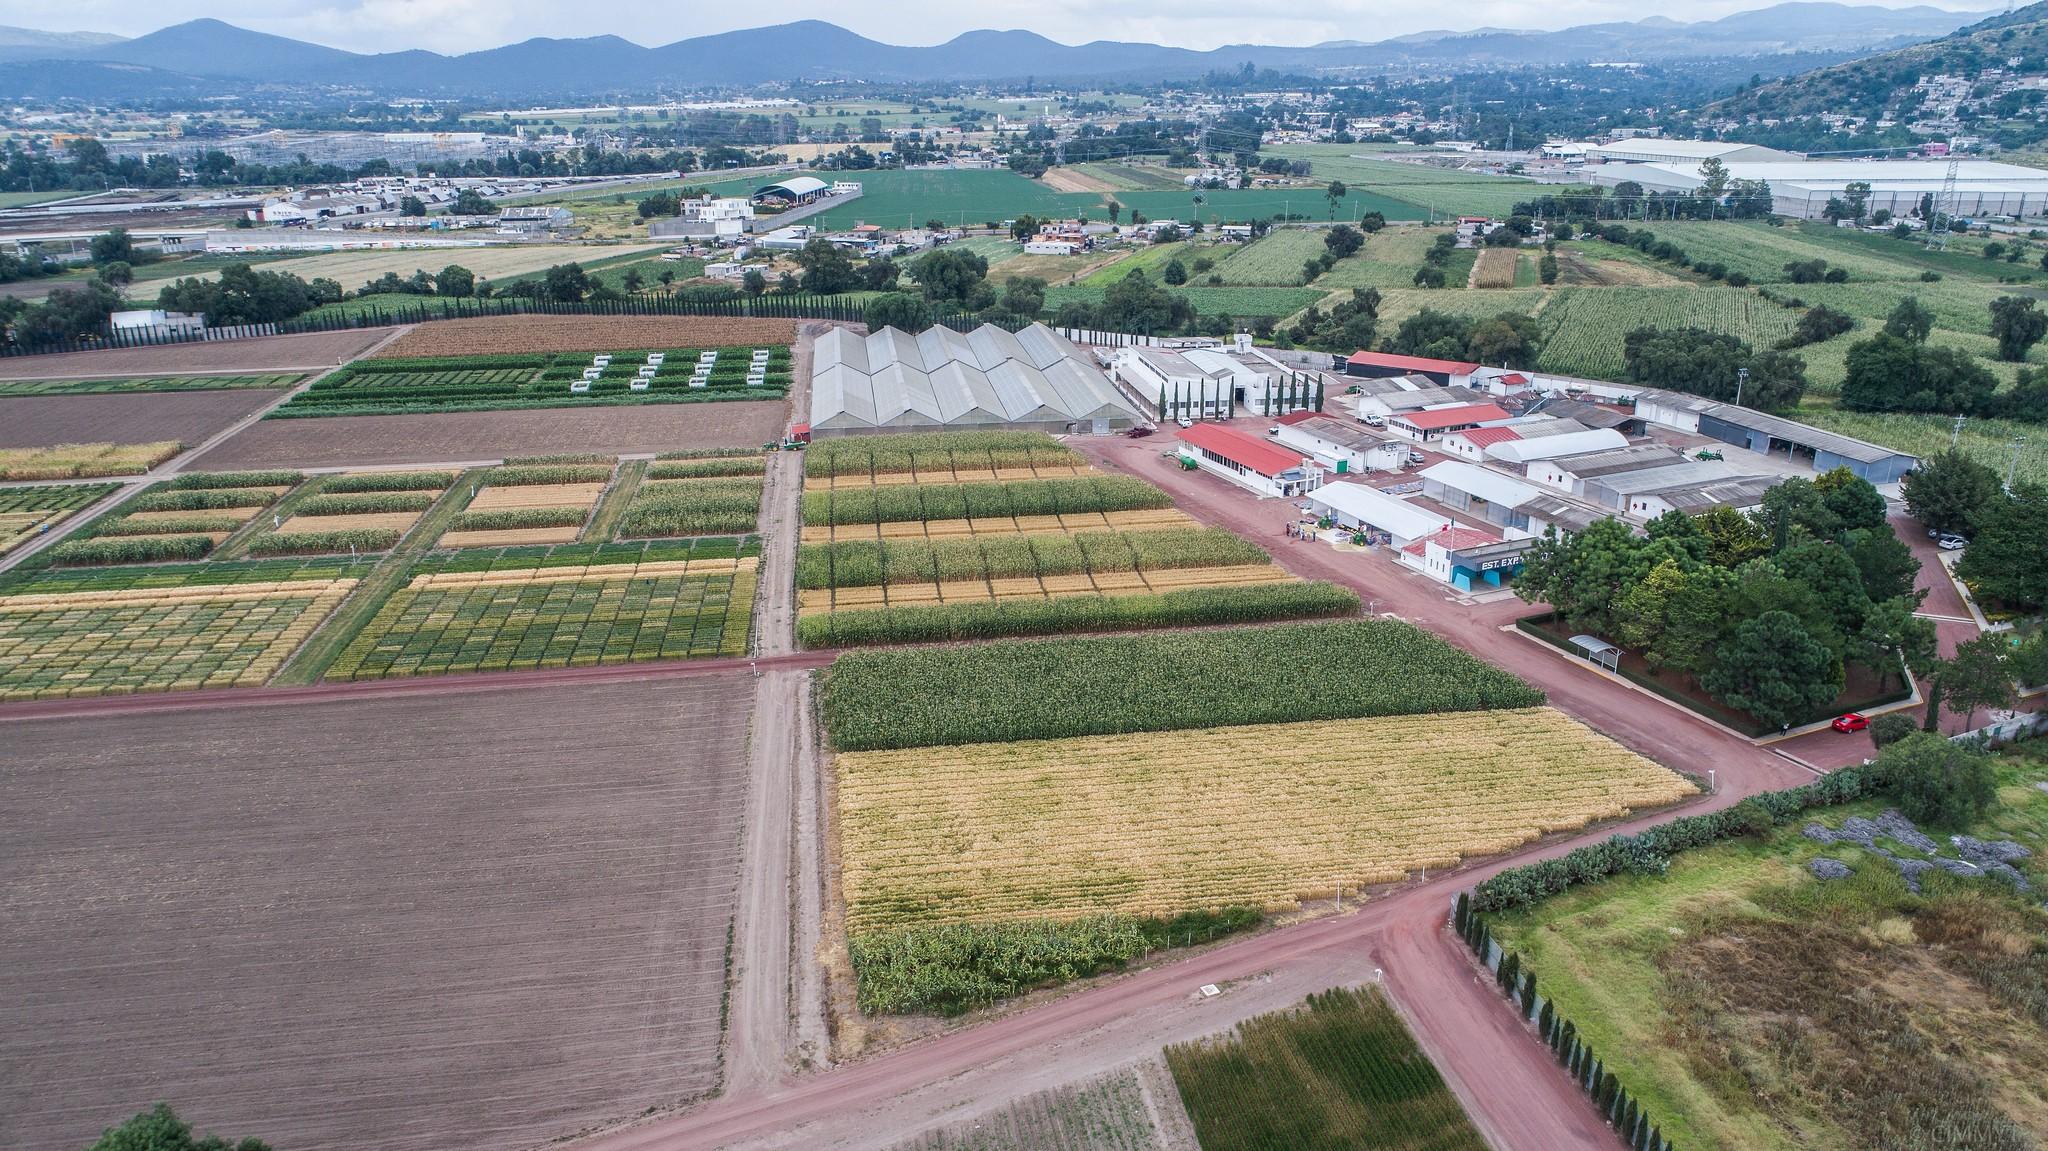 Maize and wheat fields at CIMMYT's El Batán experimental station.